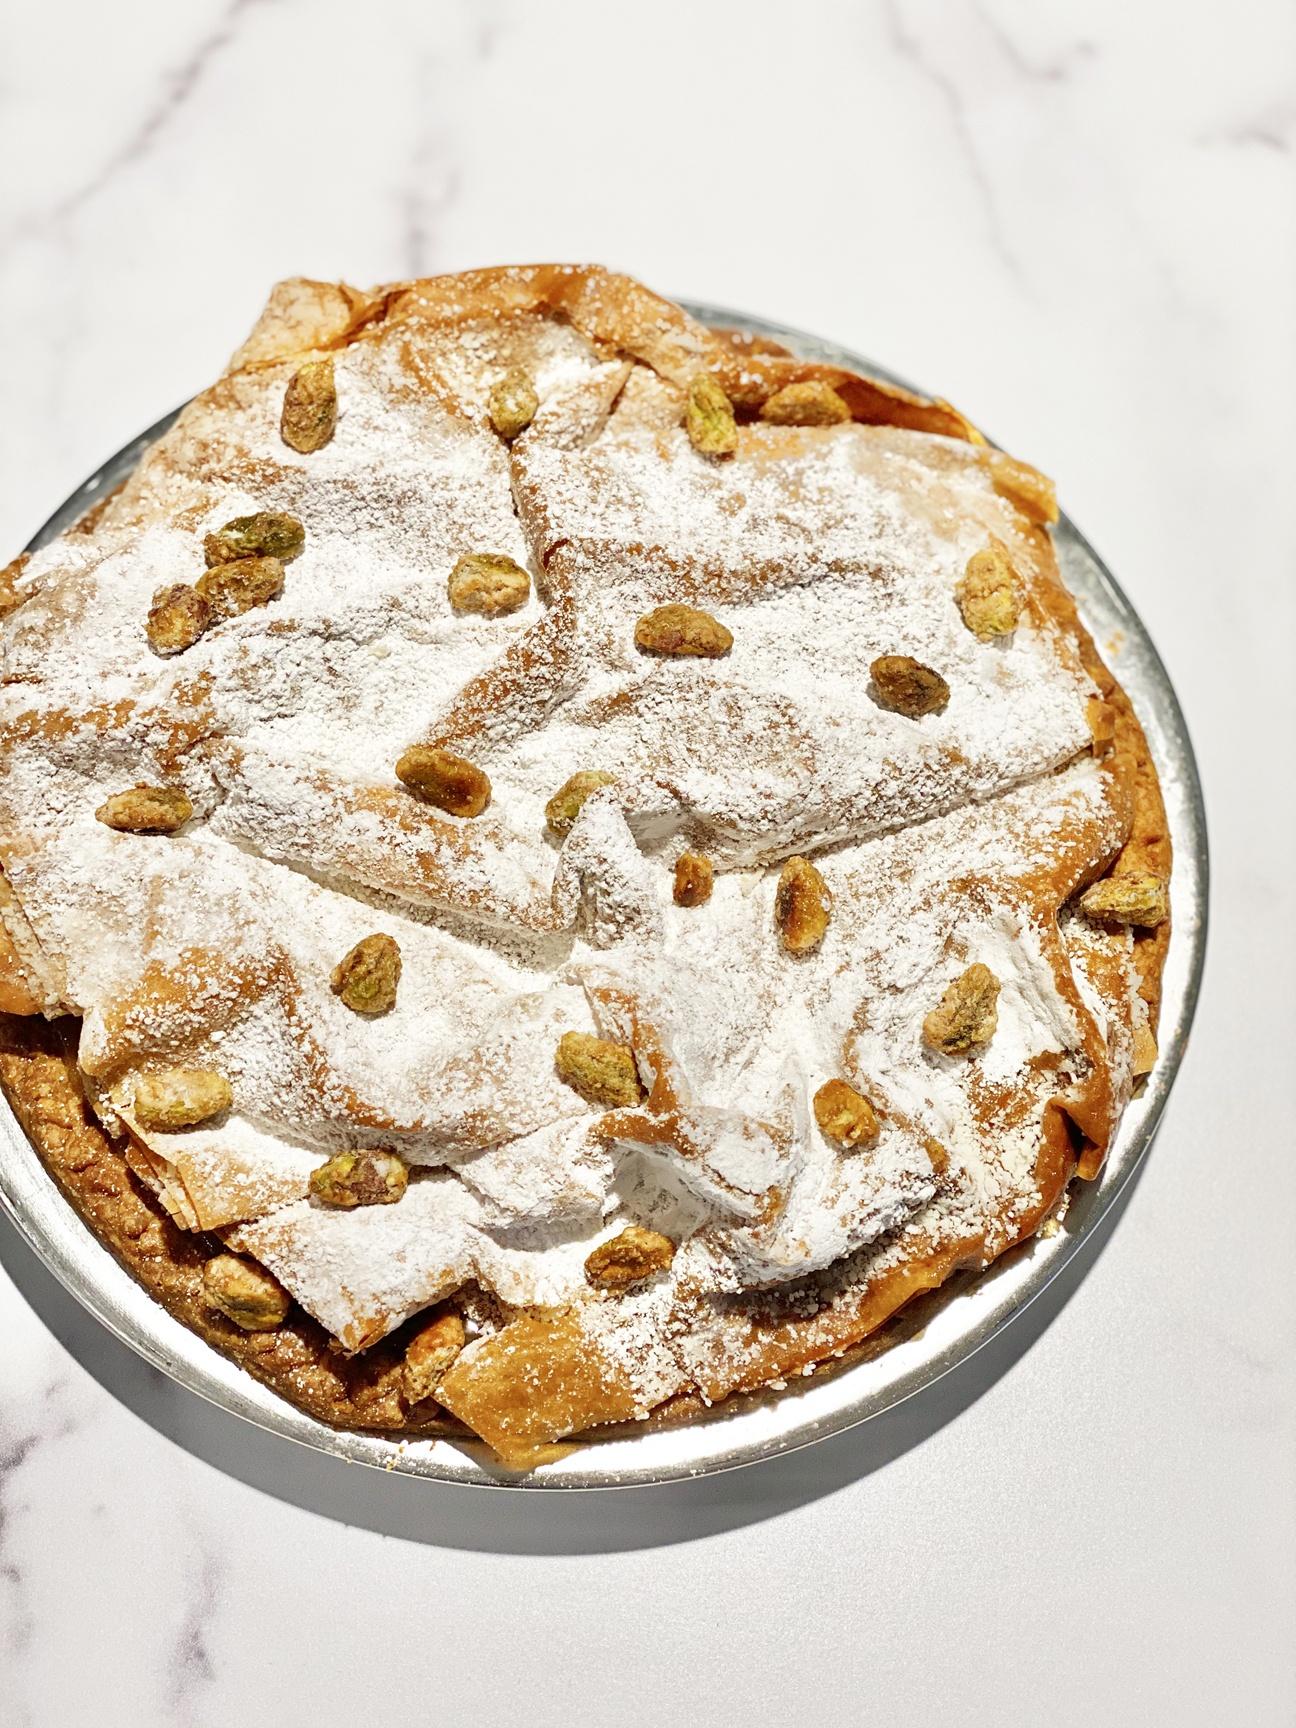 DAB Pie Night 2021 - Morrocan Orange Blossom Pistachio Pie